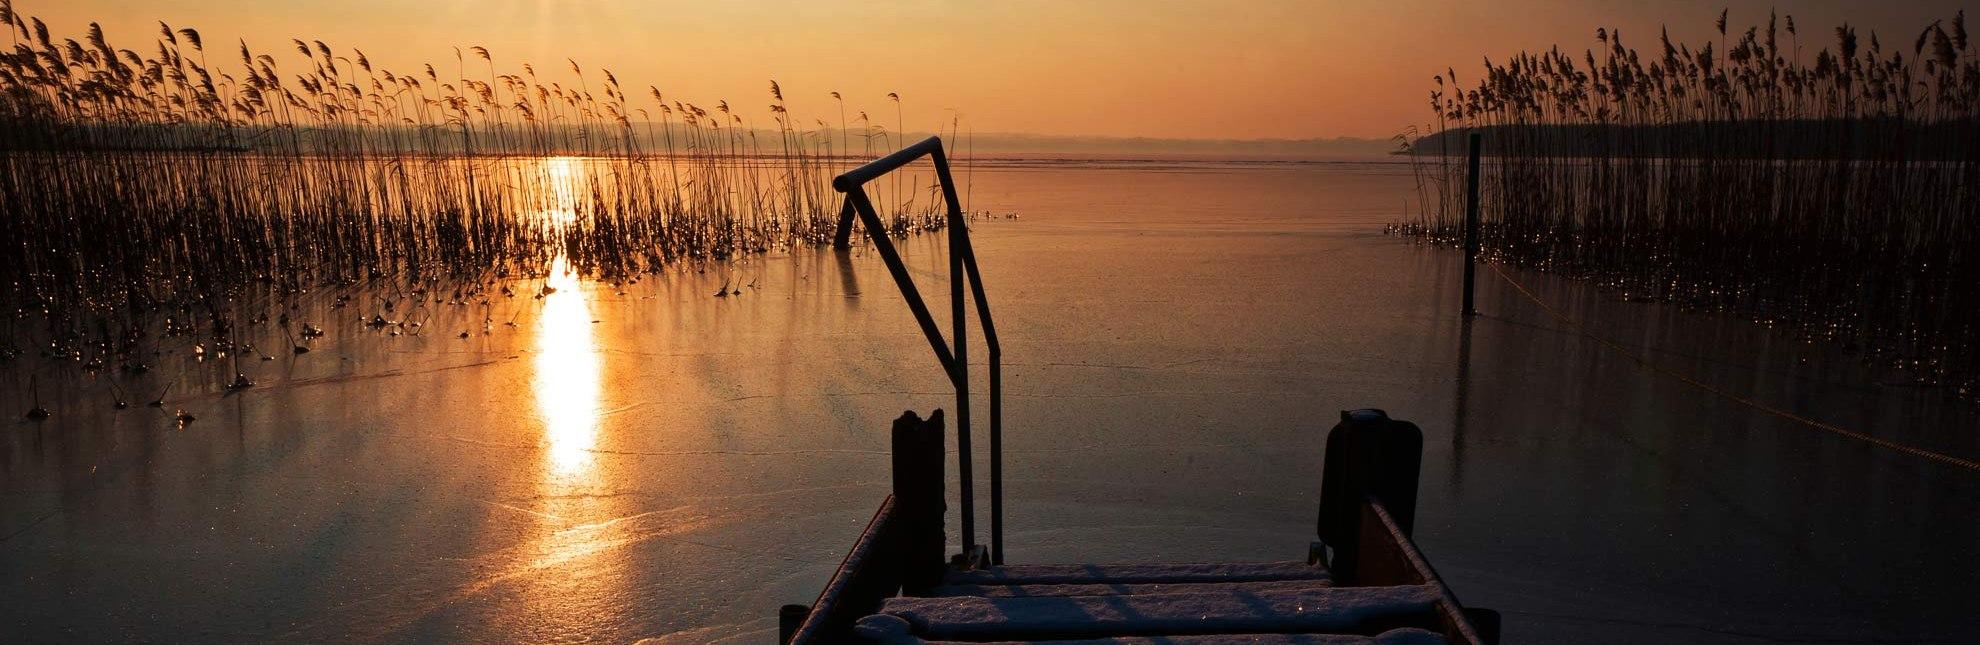 Winter am Ratzeburger See, © Thomas Ebelt